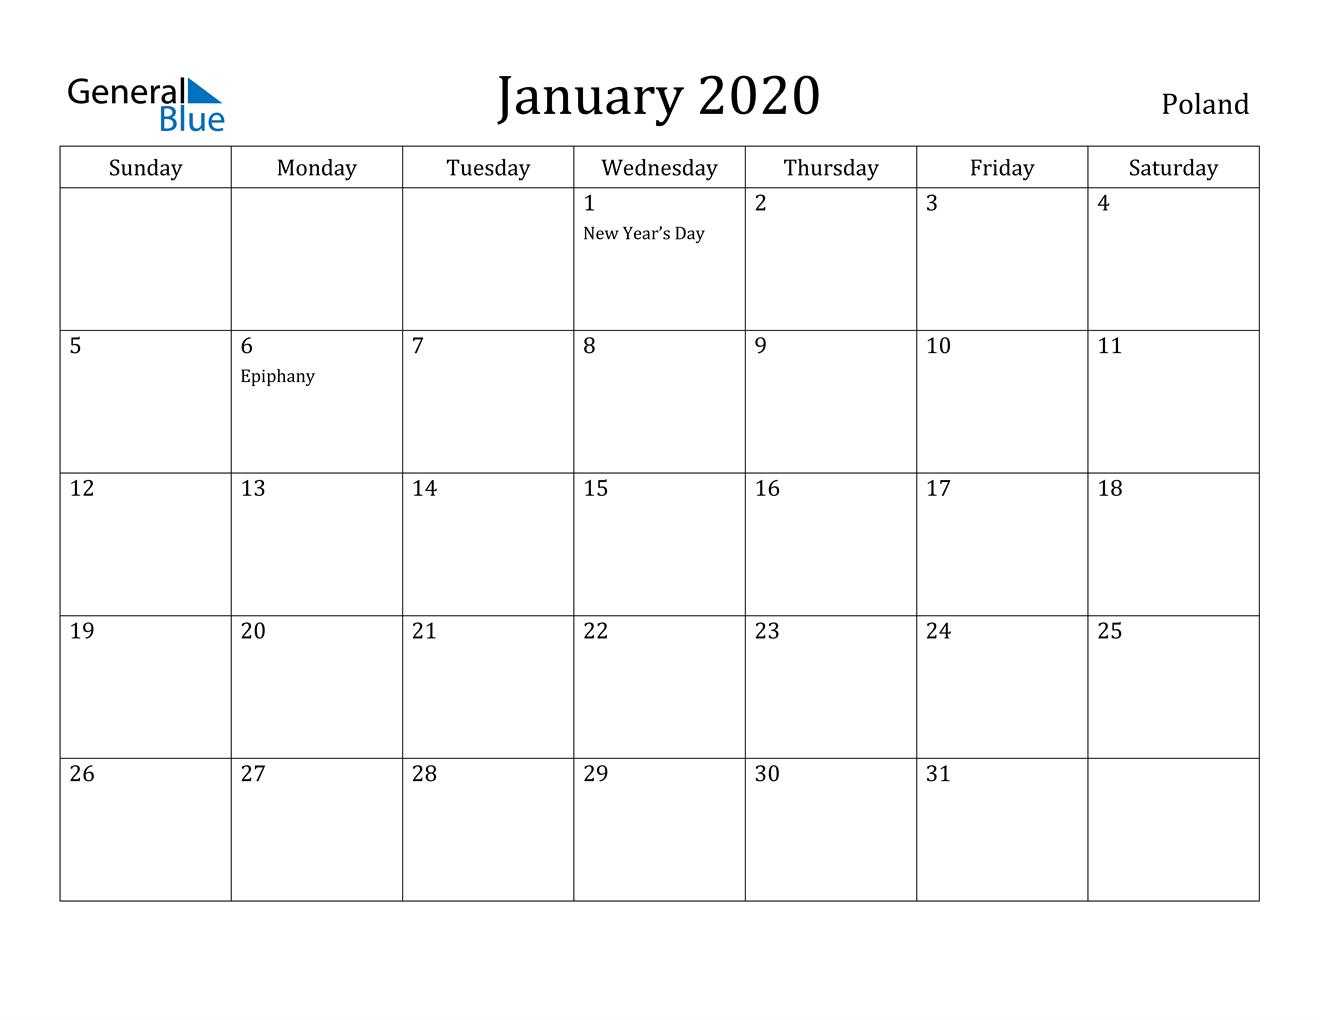 Image of January 2020 Poland Calendar with Holidays Calendar